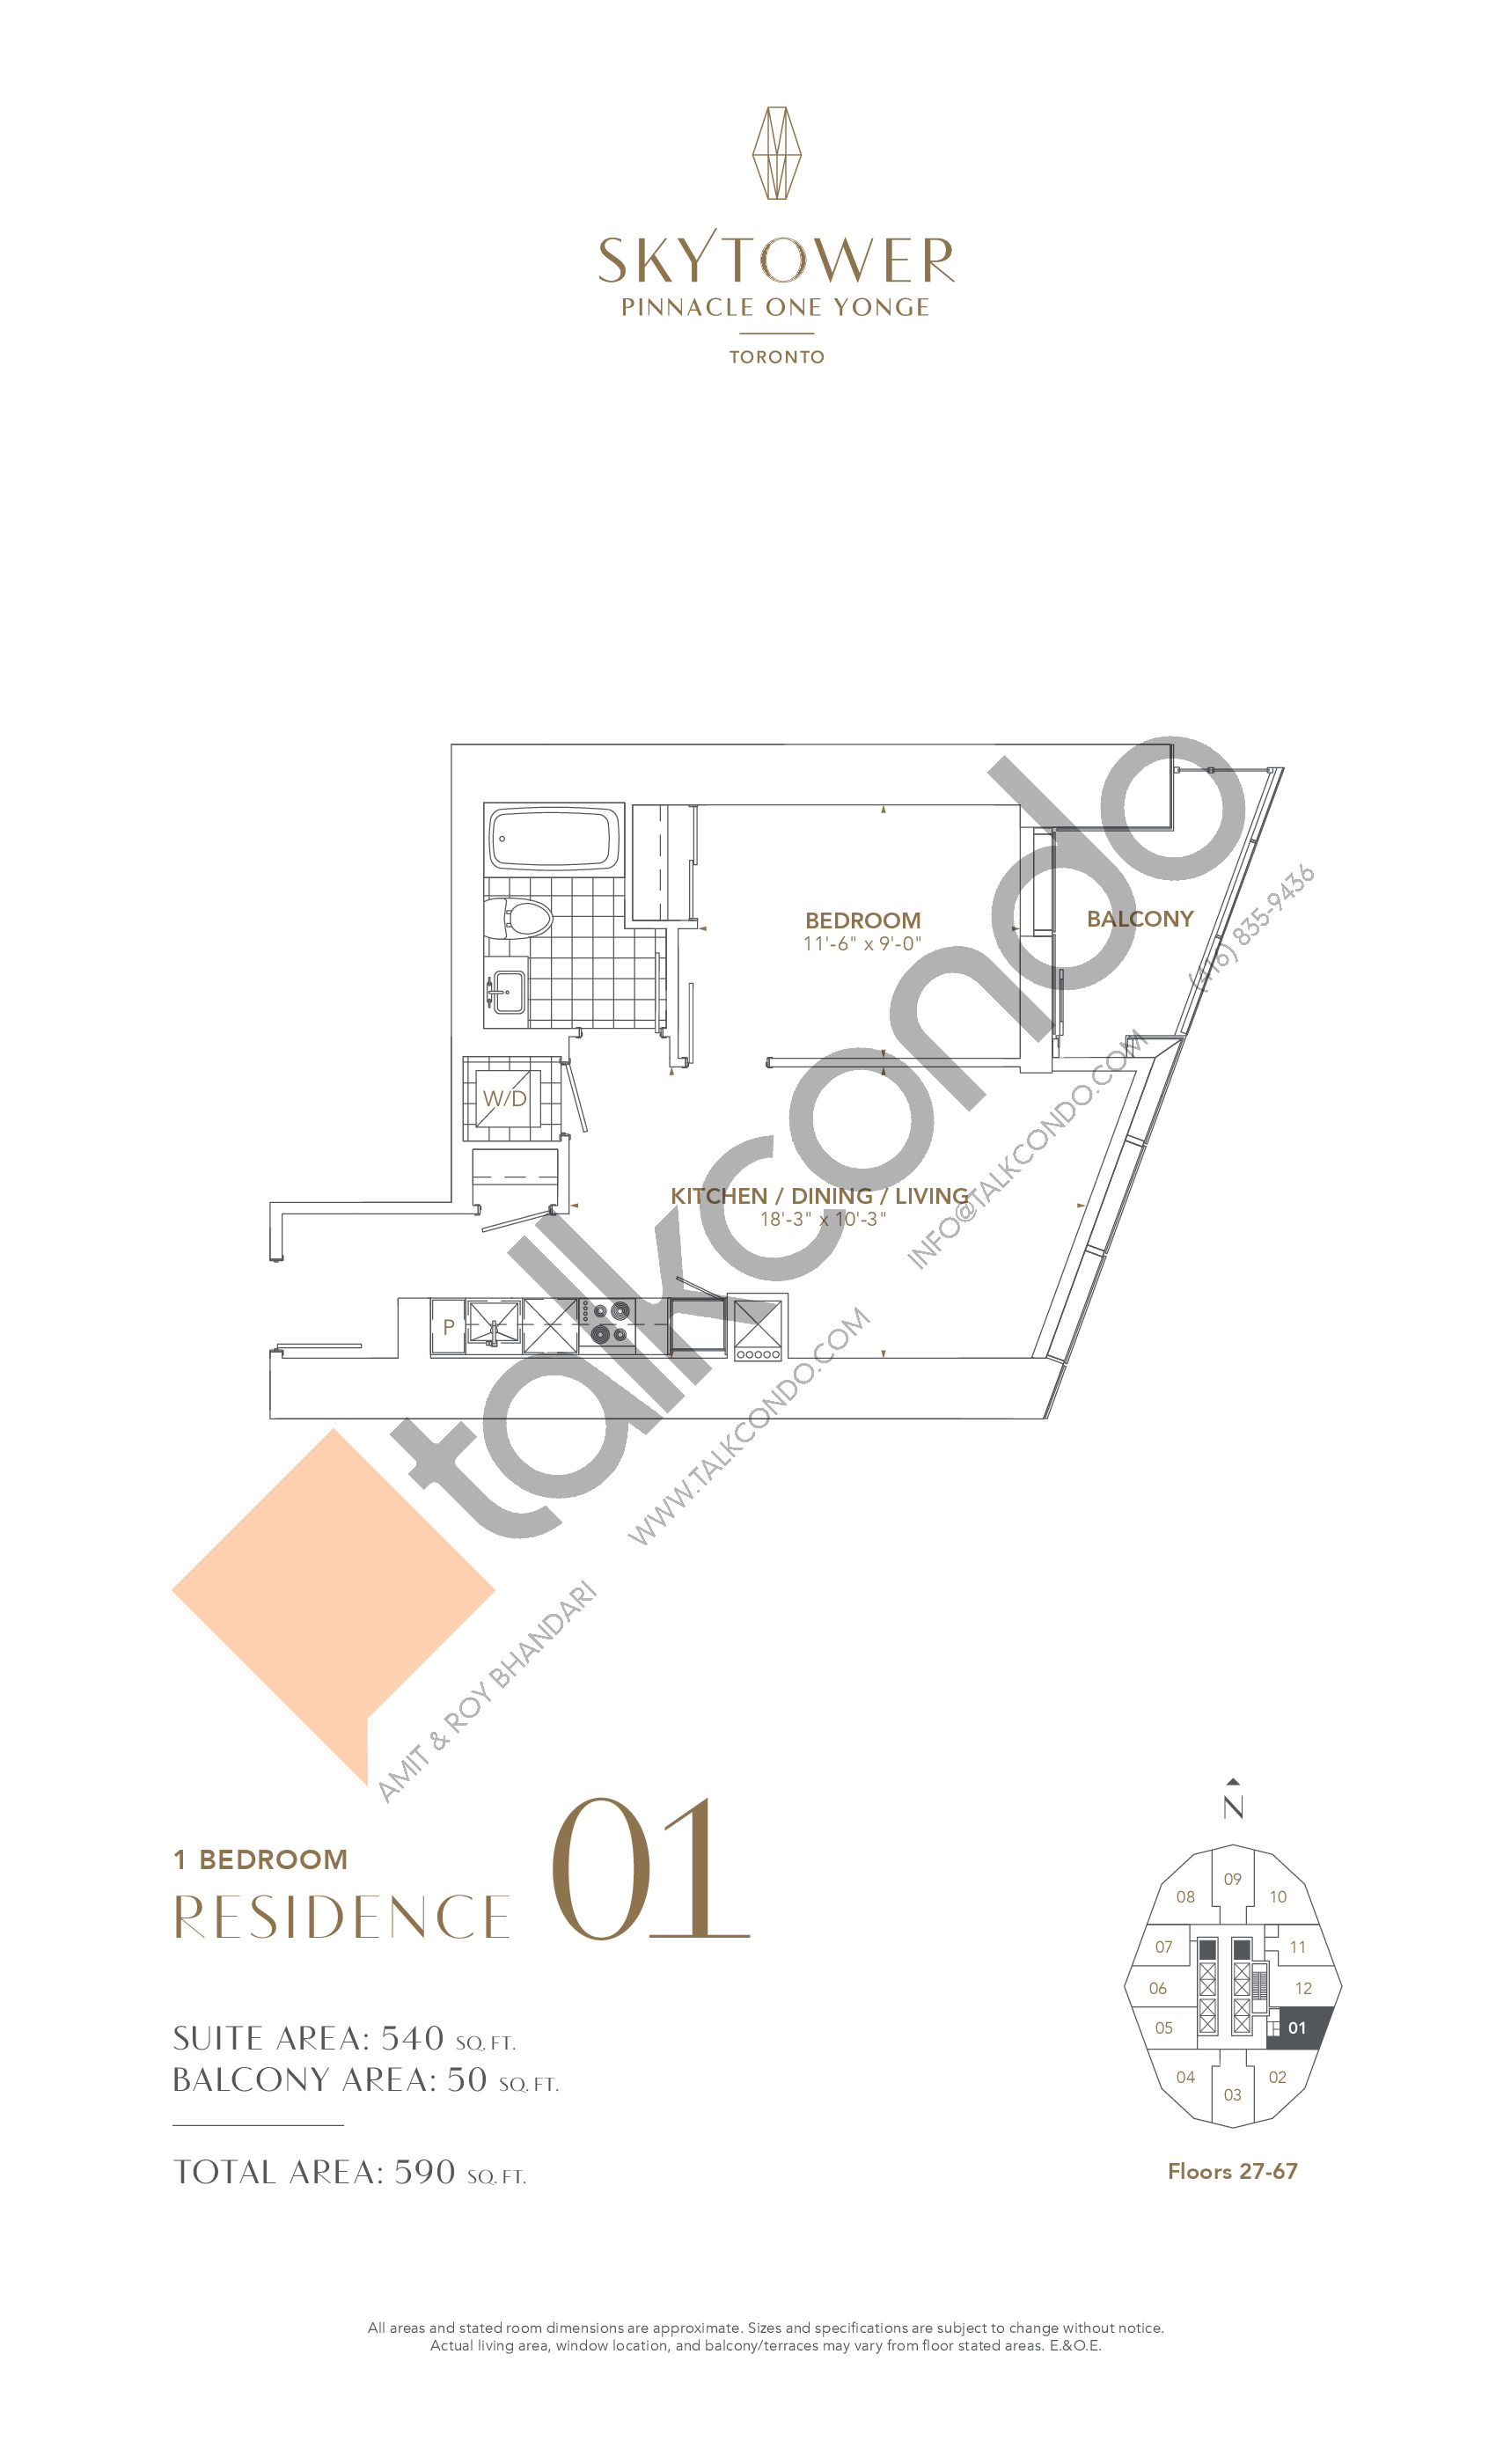 Residence 01 Floor Plan at SkyTower at Pinnacle One Yonge - 540 sq.ft